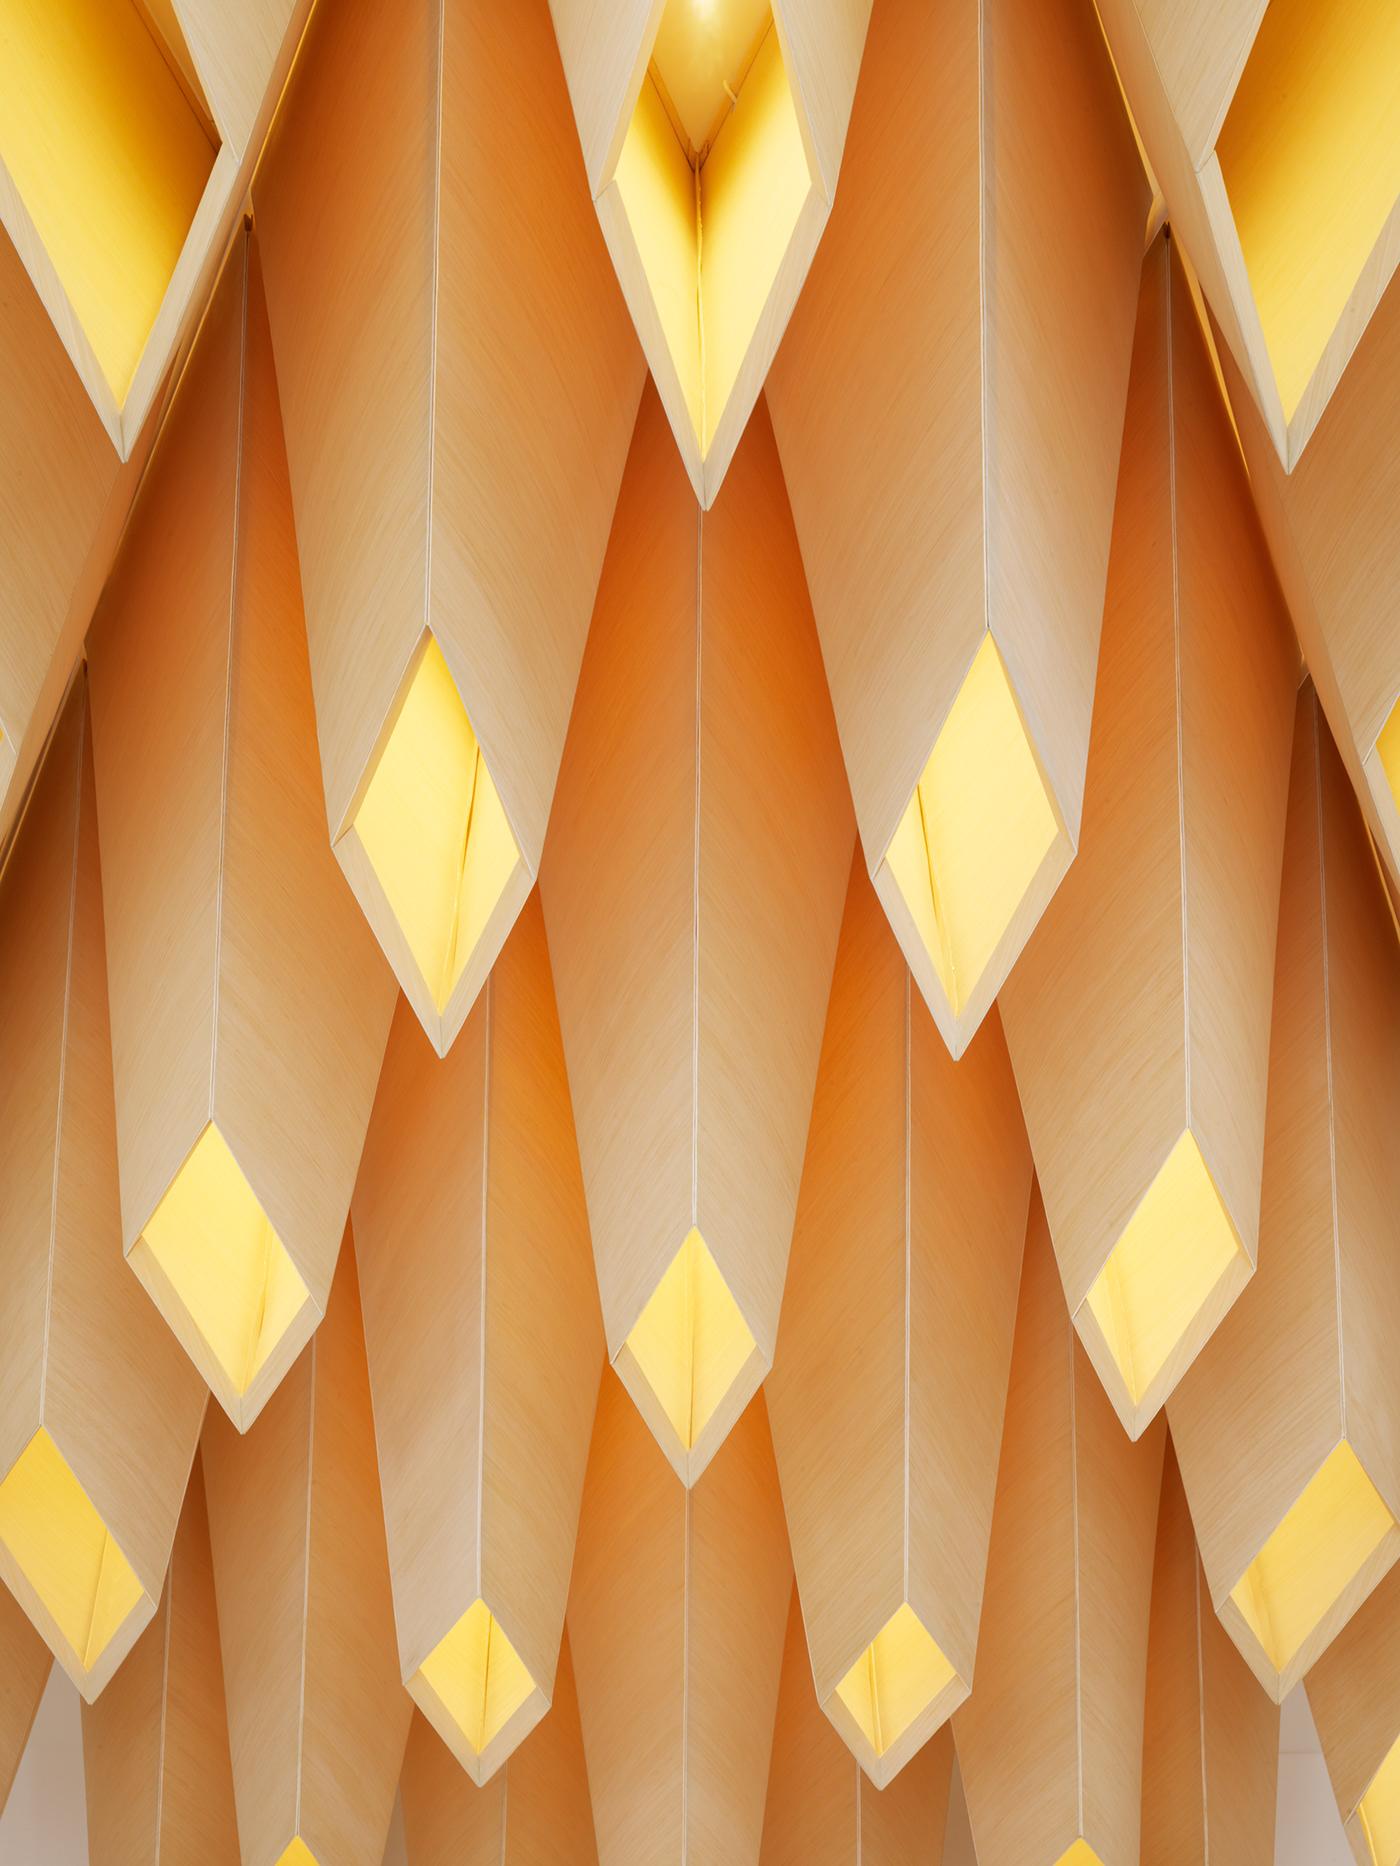 IwamotoScott architecture san francisco Lobby public art digital fabrication wood installation popos interior design